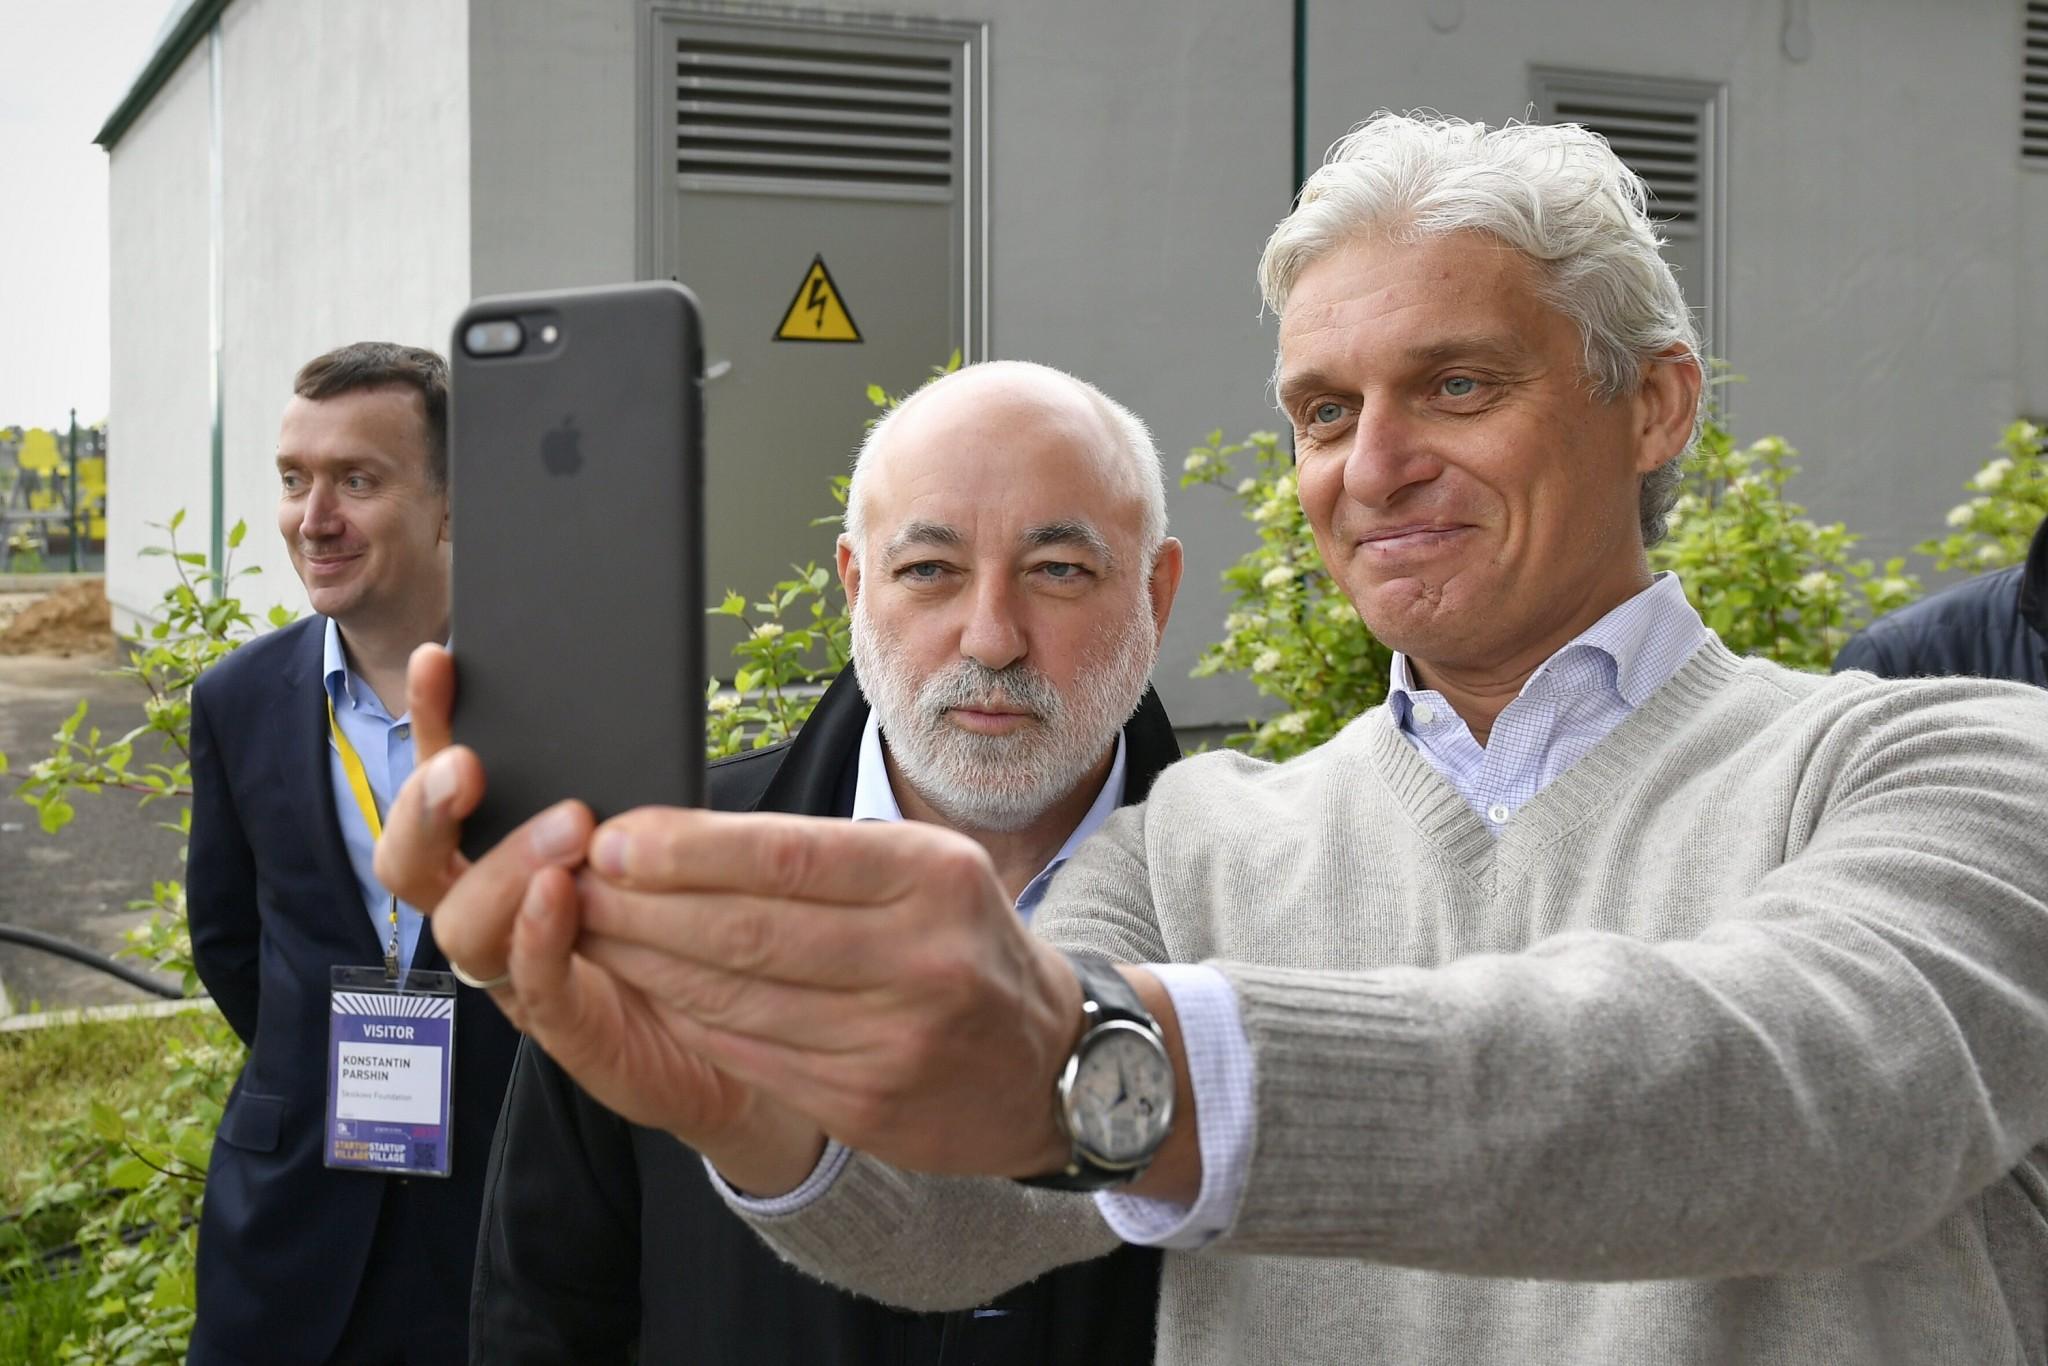 Skolkovo Foundation President Victor Vekselberg and entrepreneur Oleg Tinkov take a selfie together during the Startup Village.